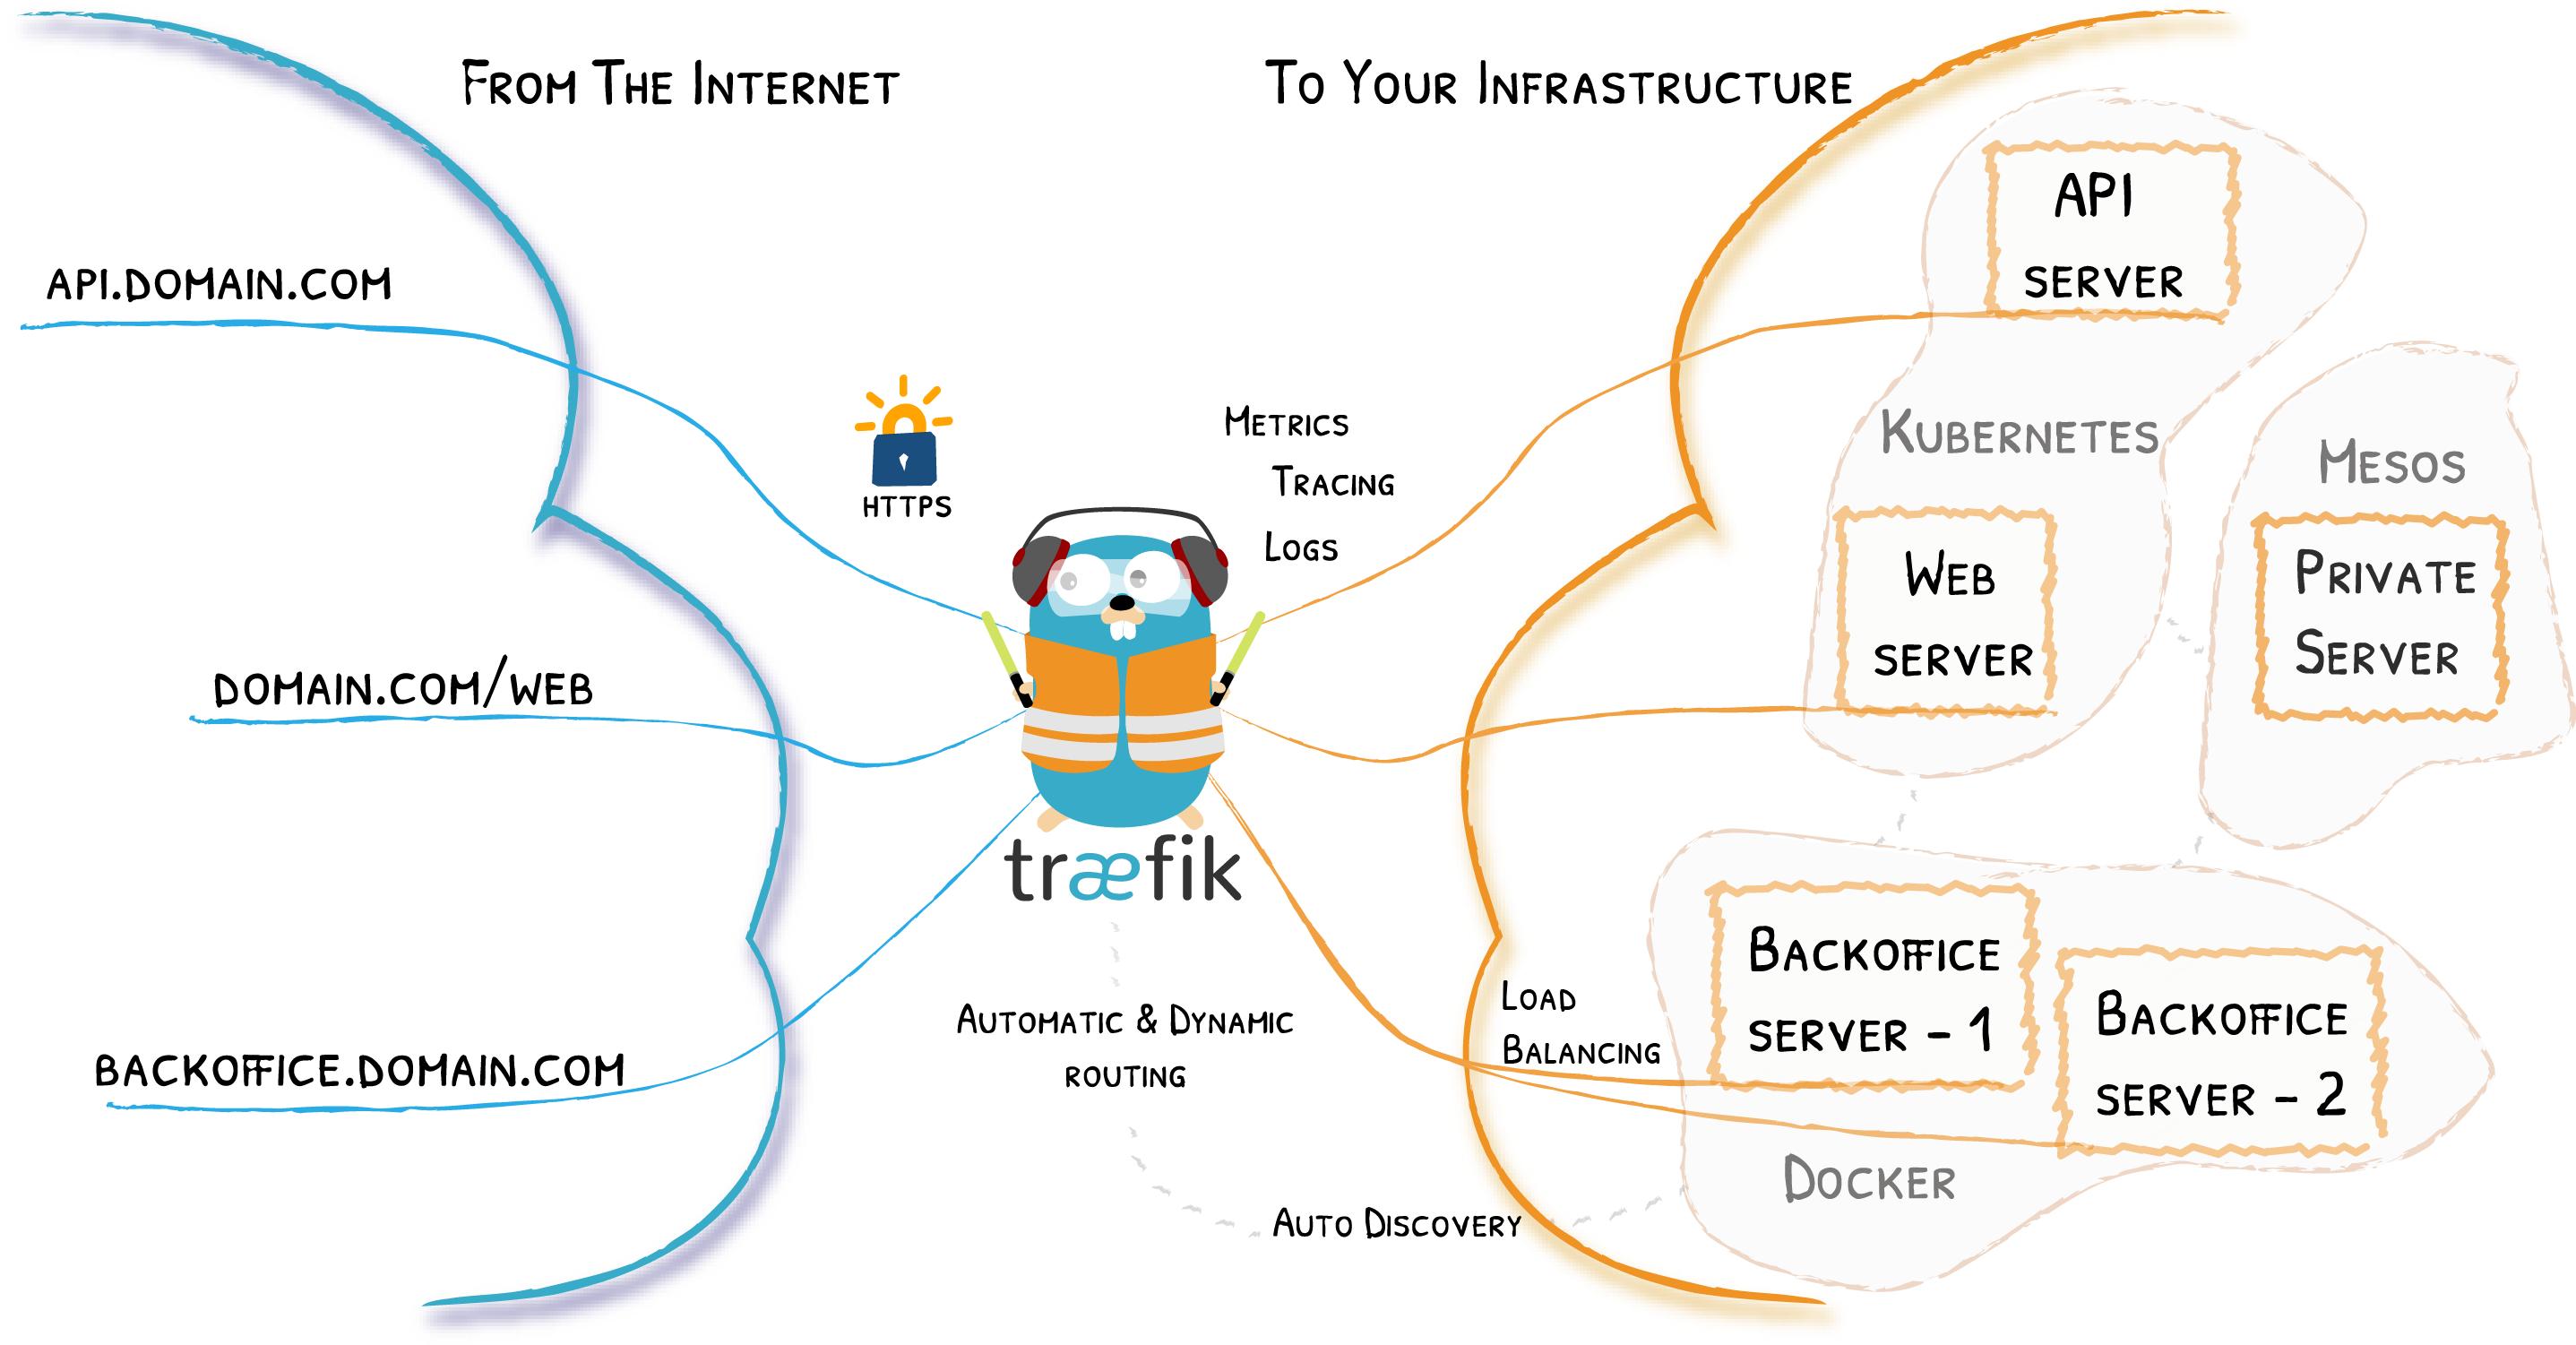 https://github.com/containous/traefik/raw/master/docs/content/assets/img/traefik-architecture.png